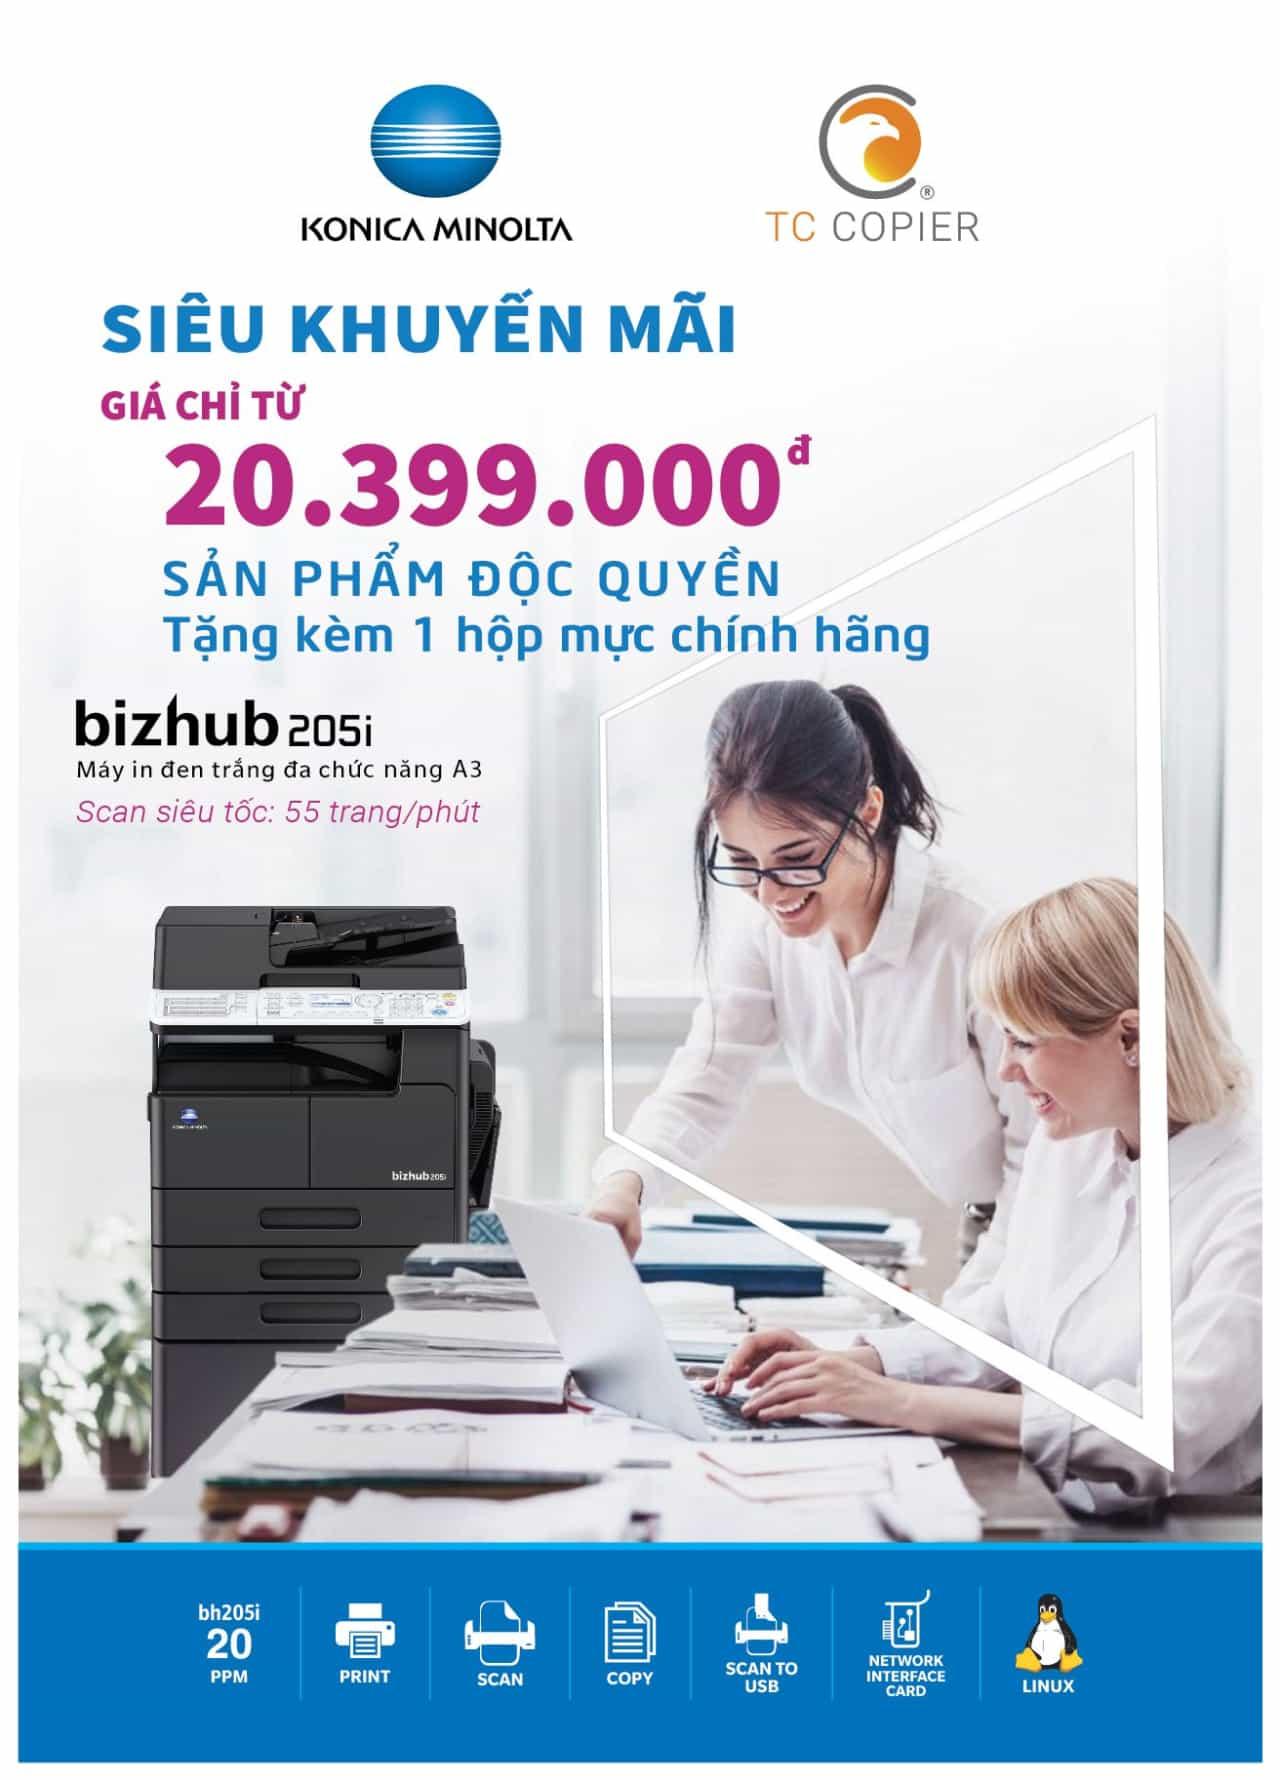 Máy photocopy Konica Minolta bizhub 205i giảm giá tặng mực